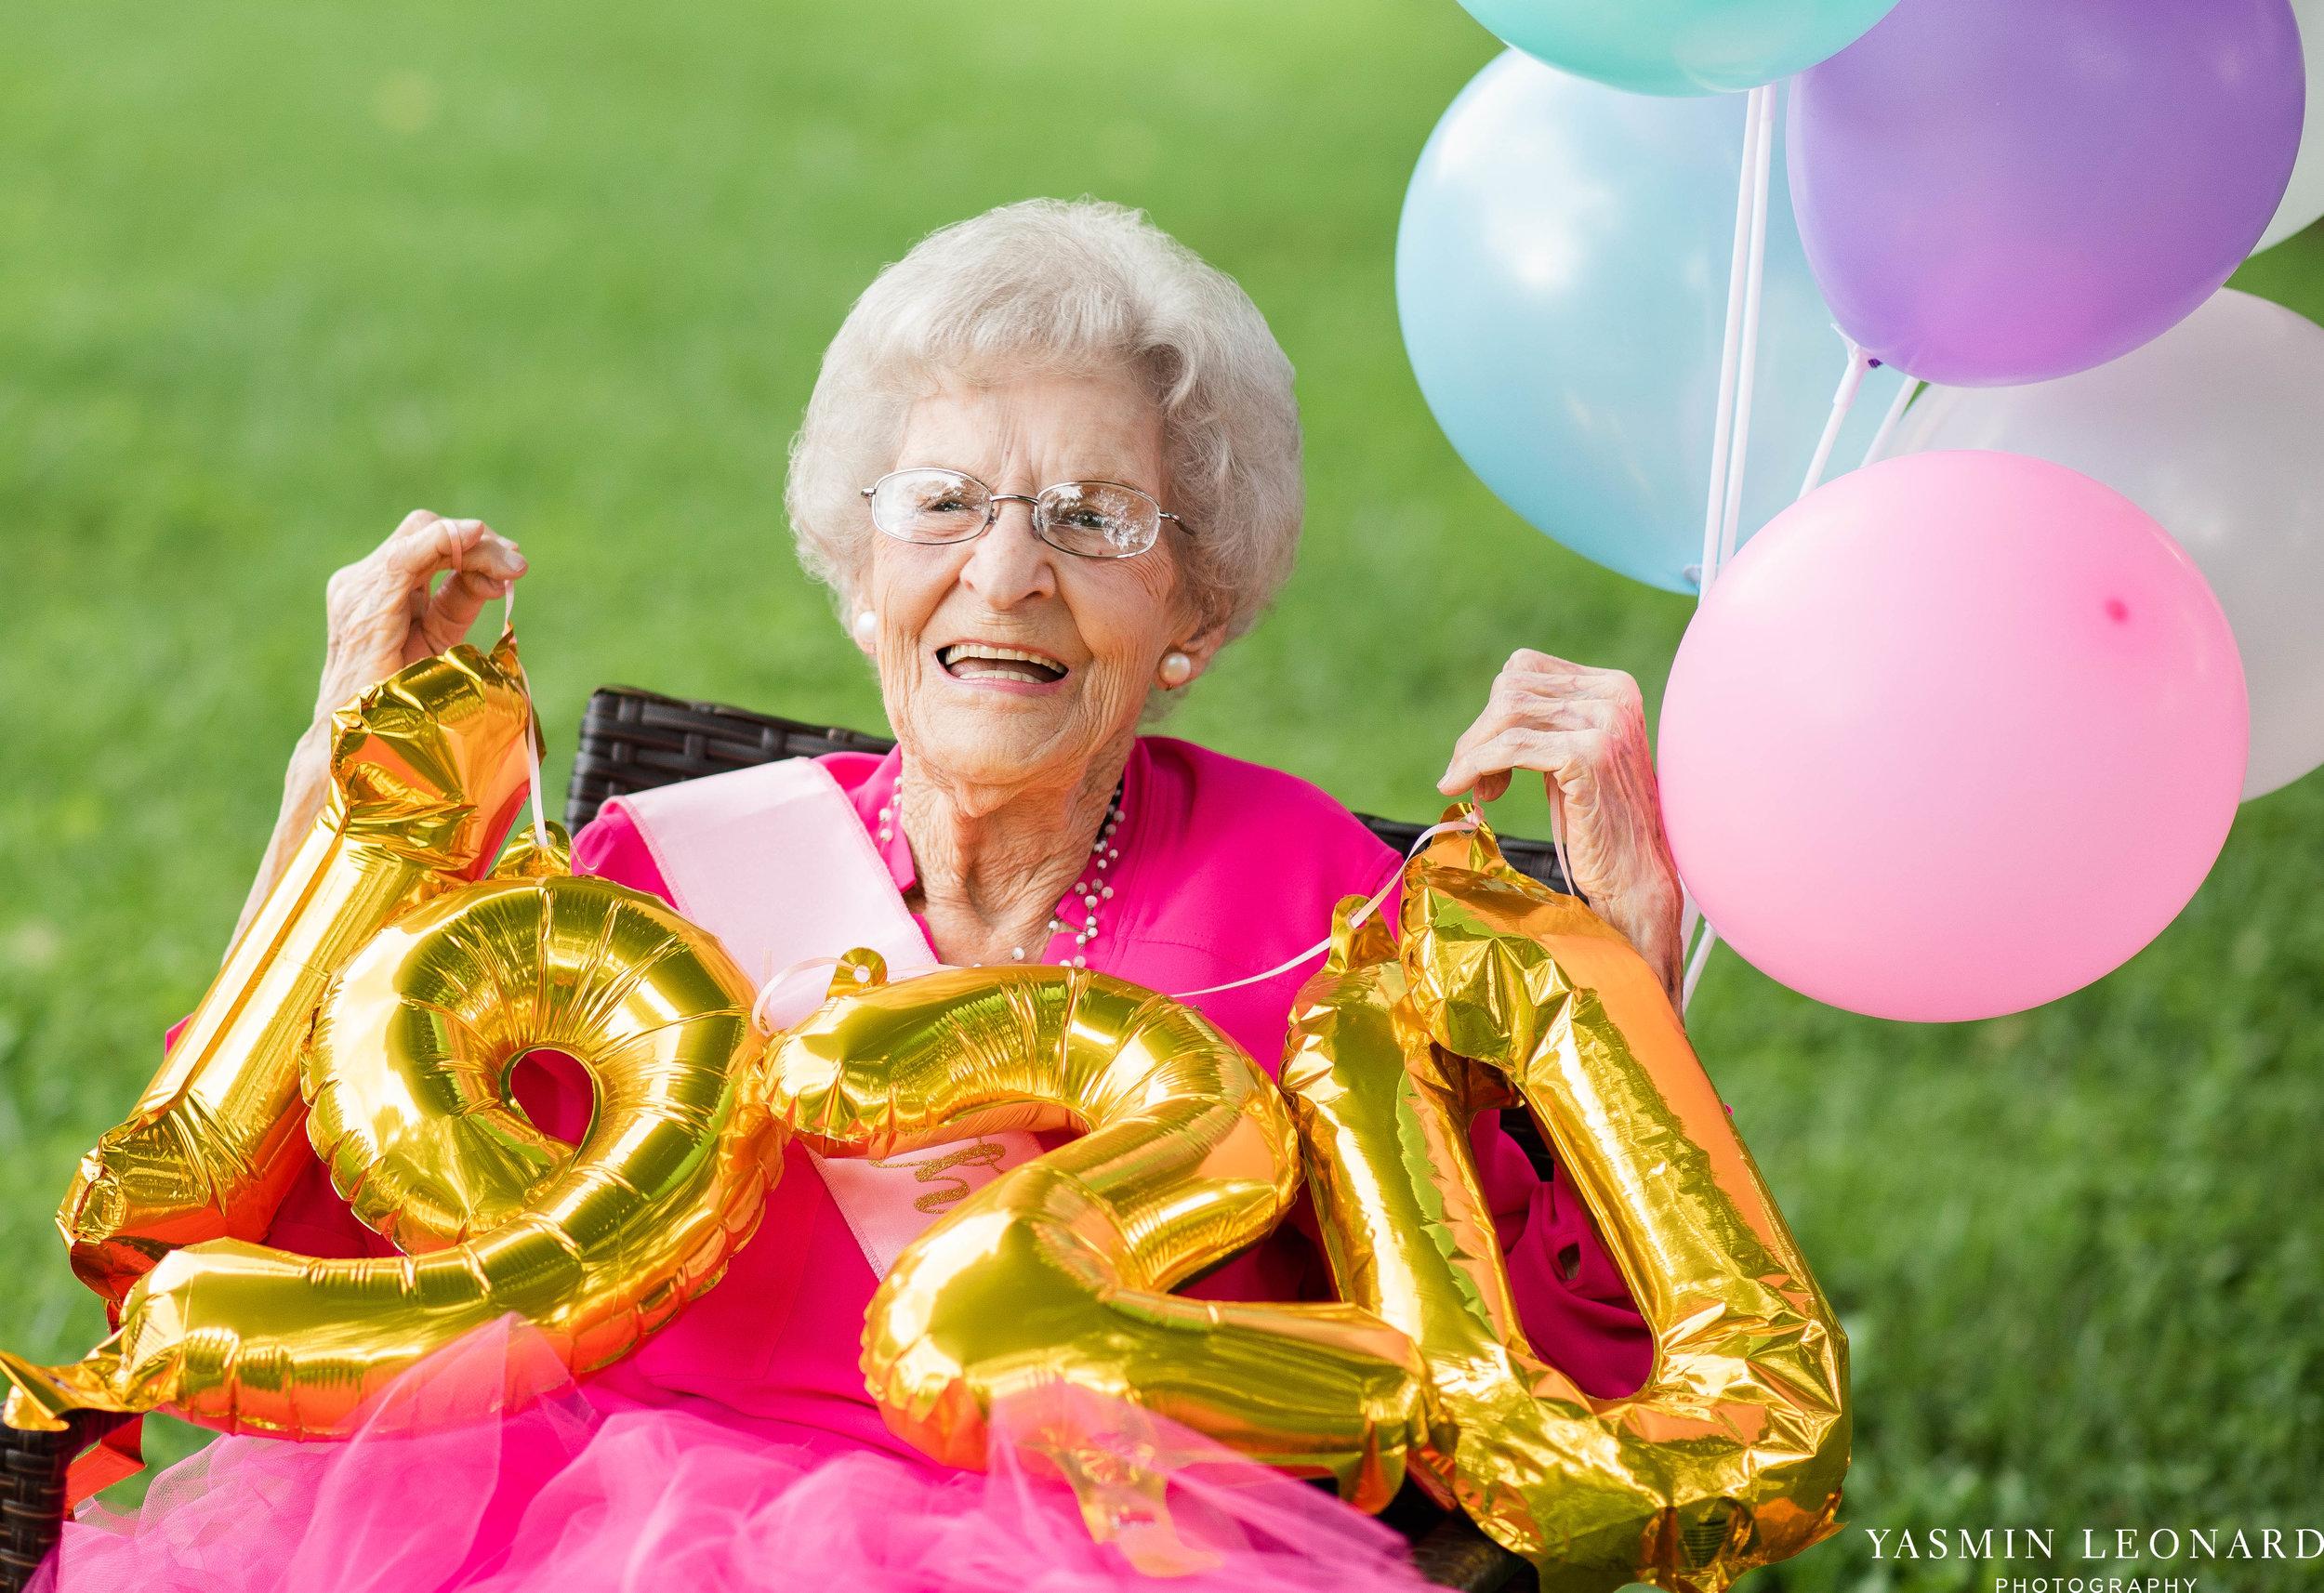 99 Year Old Birthday - Great Grandma Birthday Session - Grandma Birthday Session - 99 years Old - Adult Birthday Session - Four Generations-7.jpg